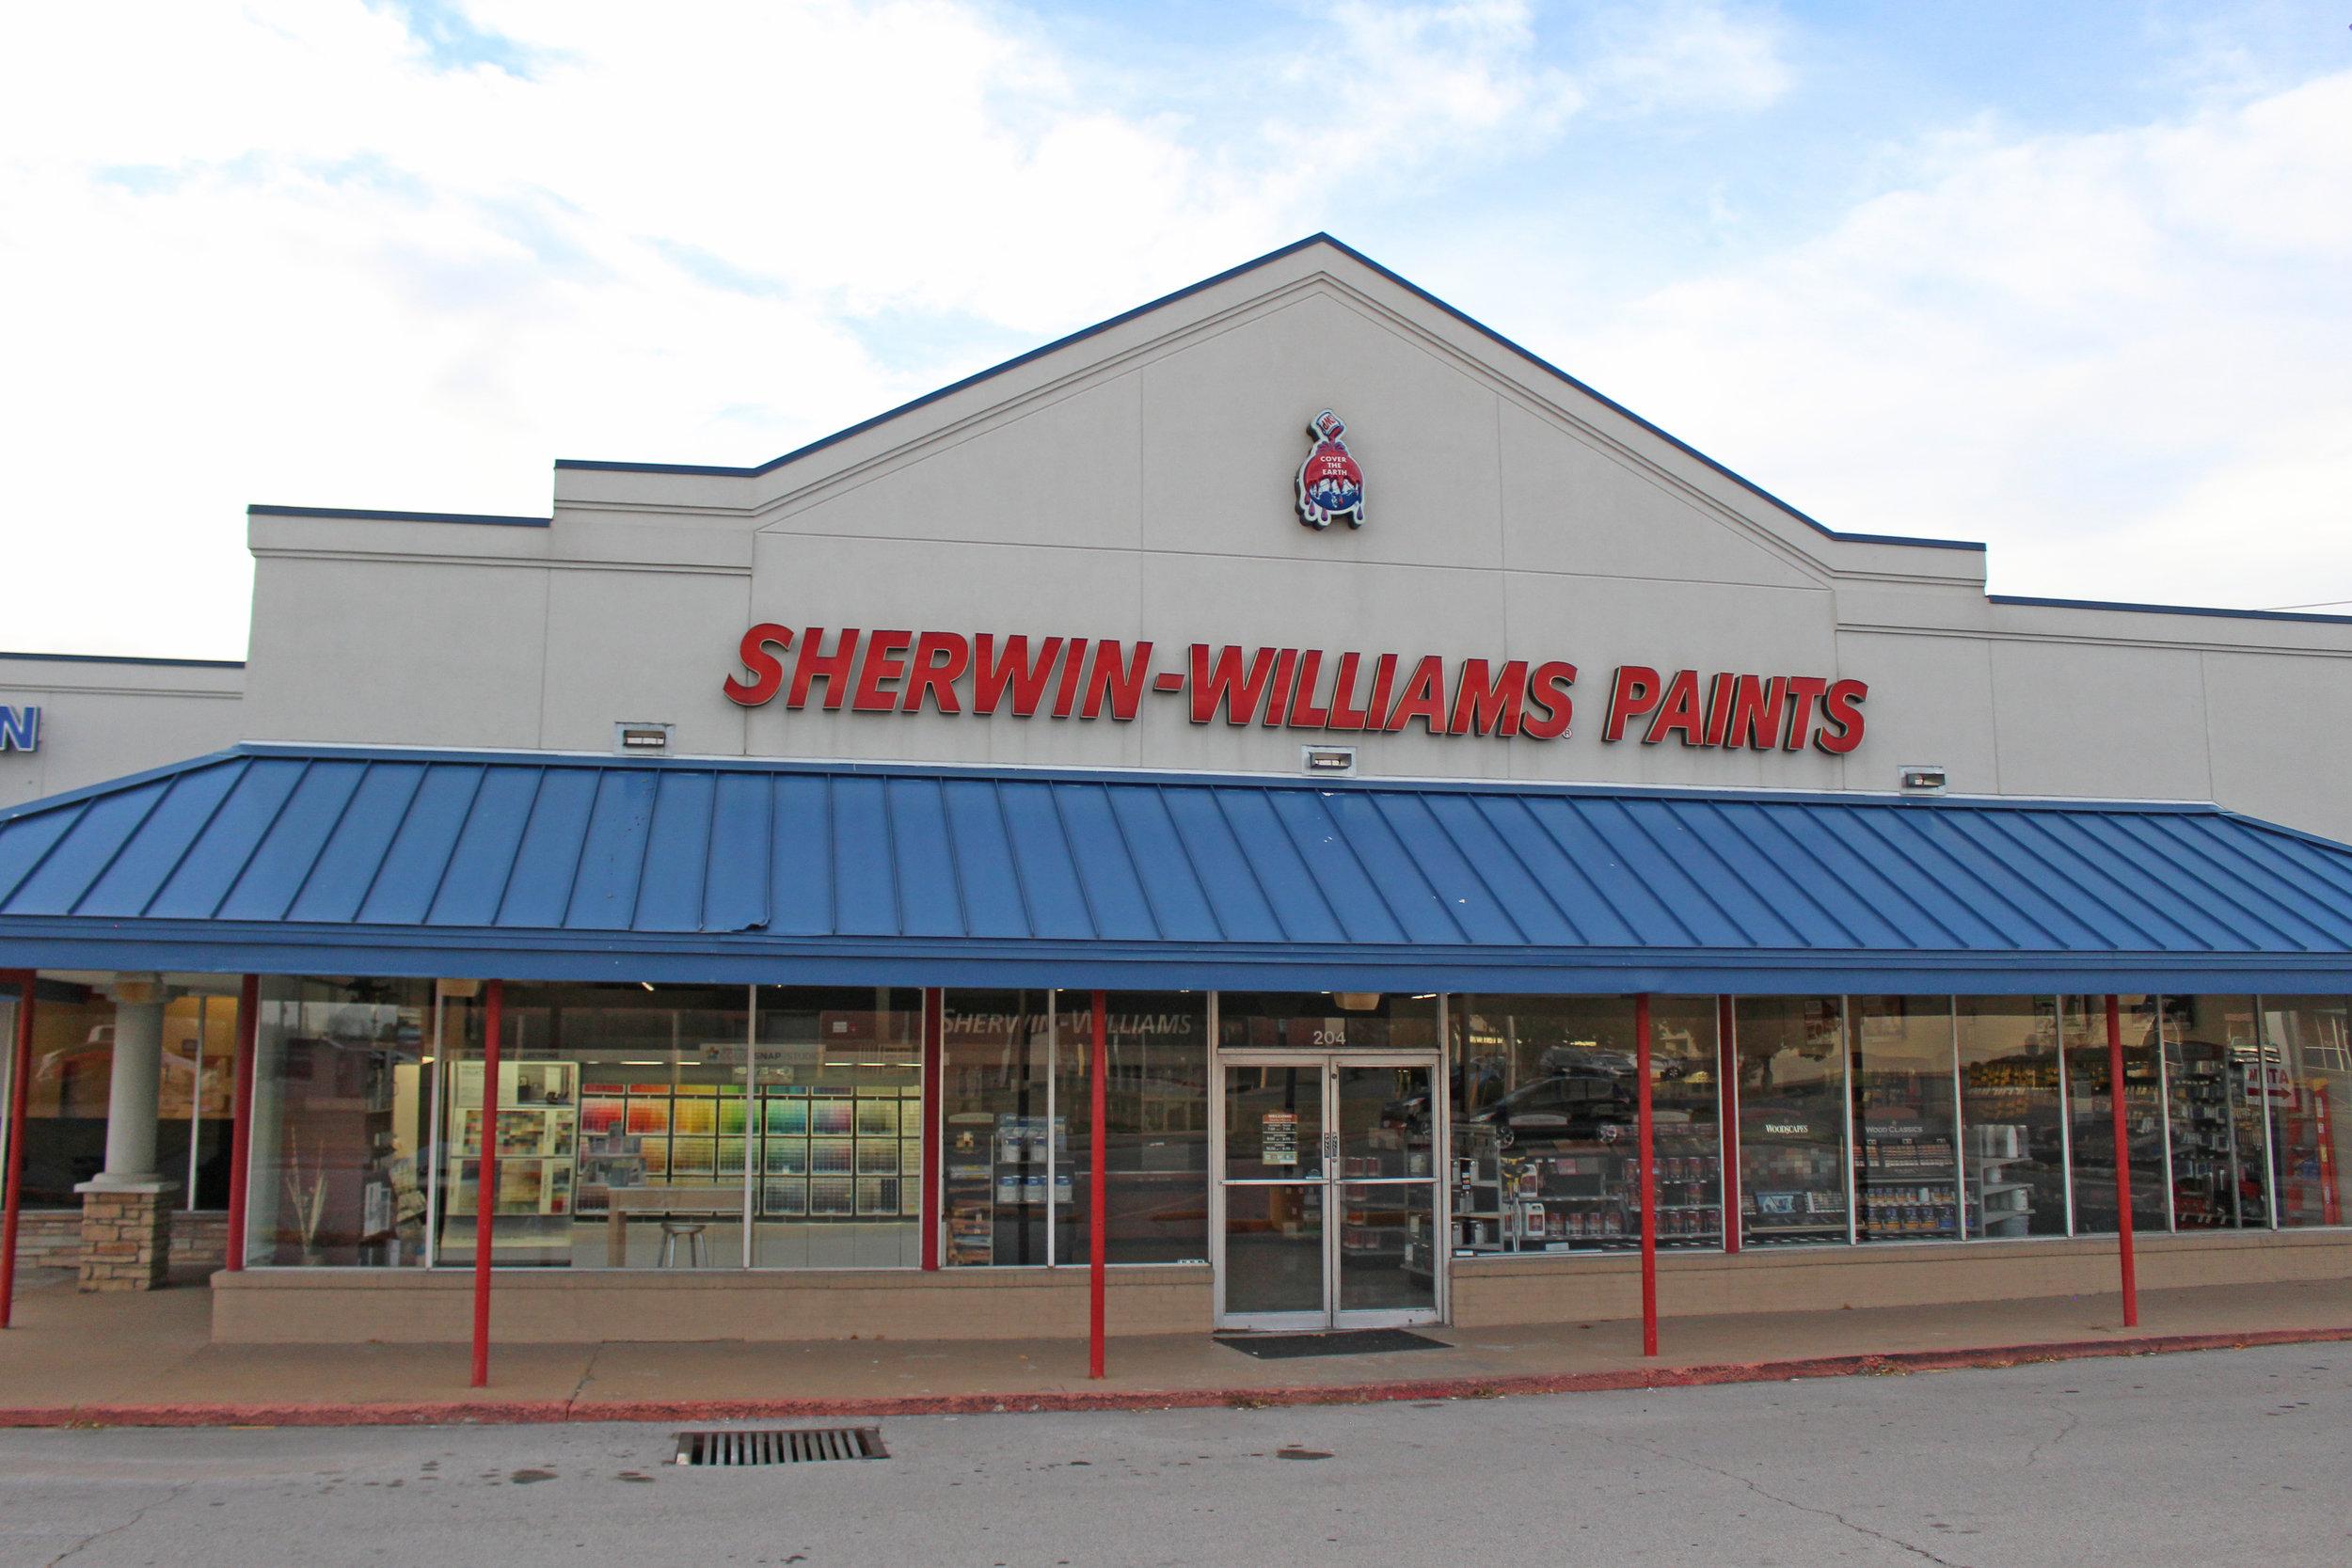 sherwin-williams paints - downtown 204 jefferson street